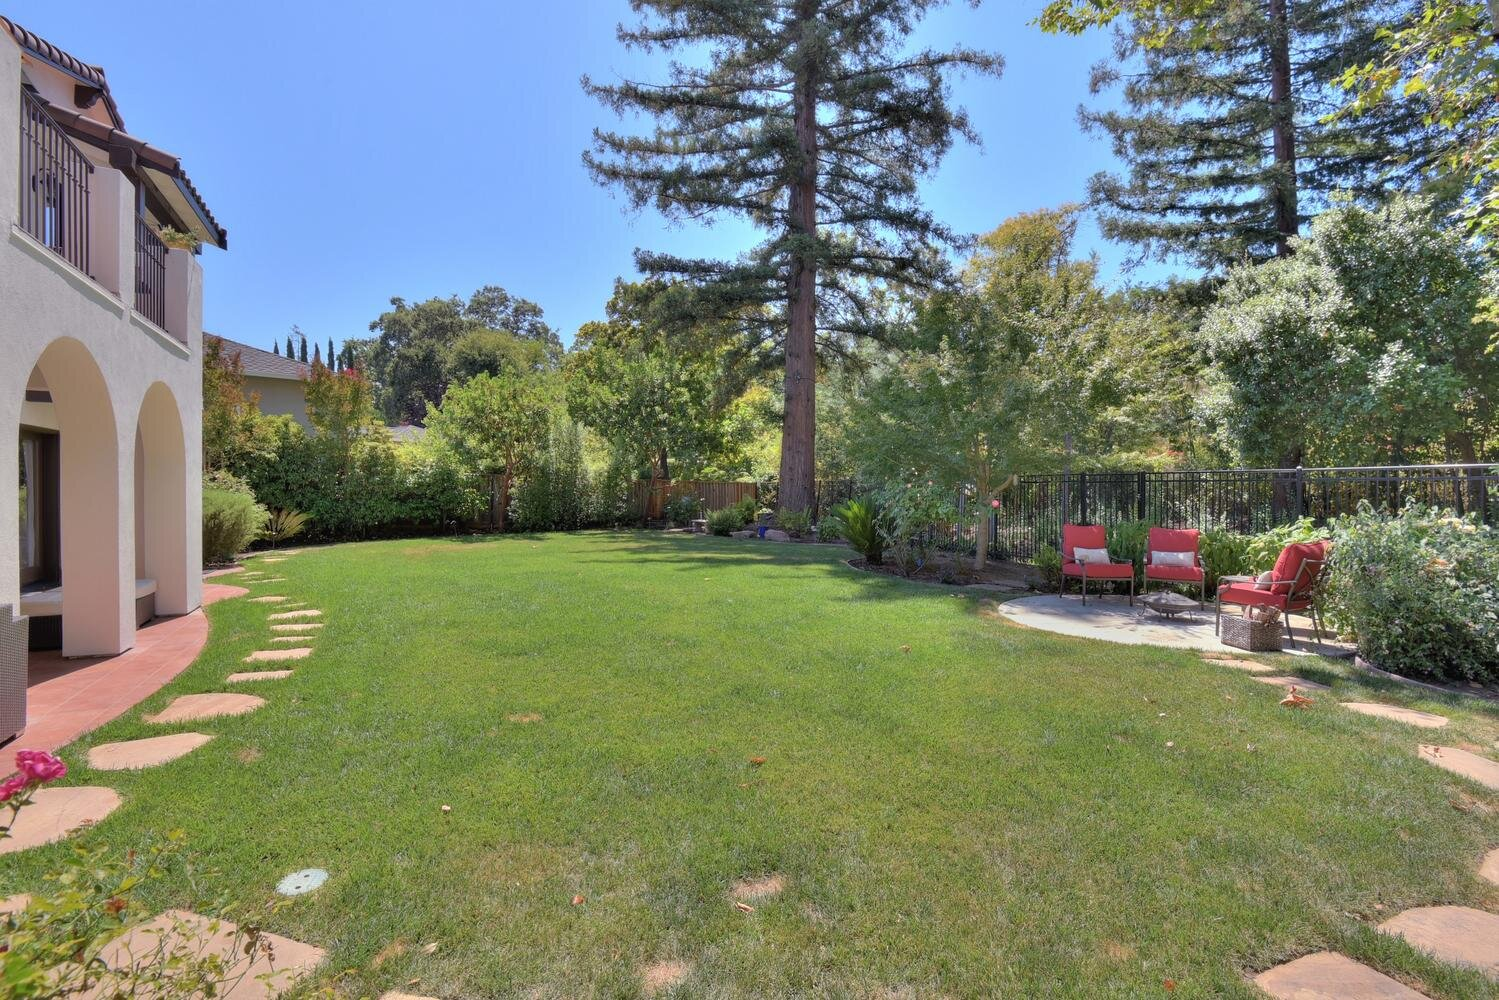 16021 Winterbrook Rd Los Gatos-large-069-065-Backyard View-1499x1000-72dpi.jpg